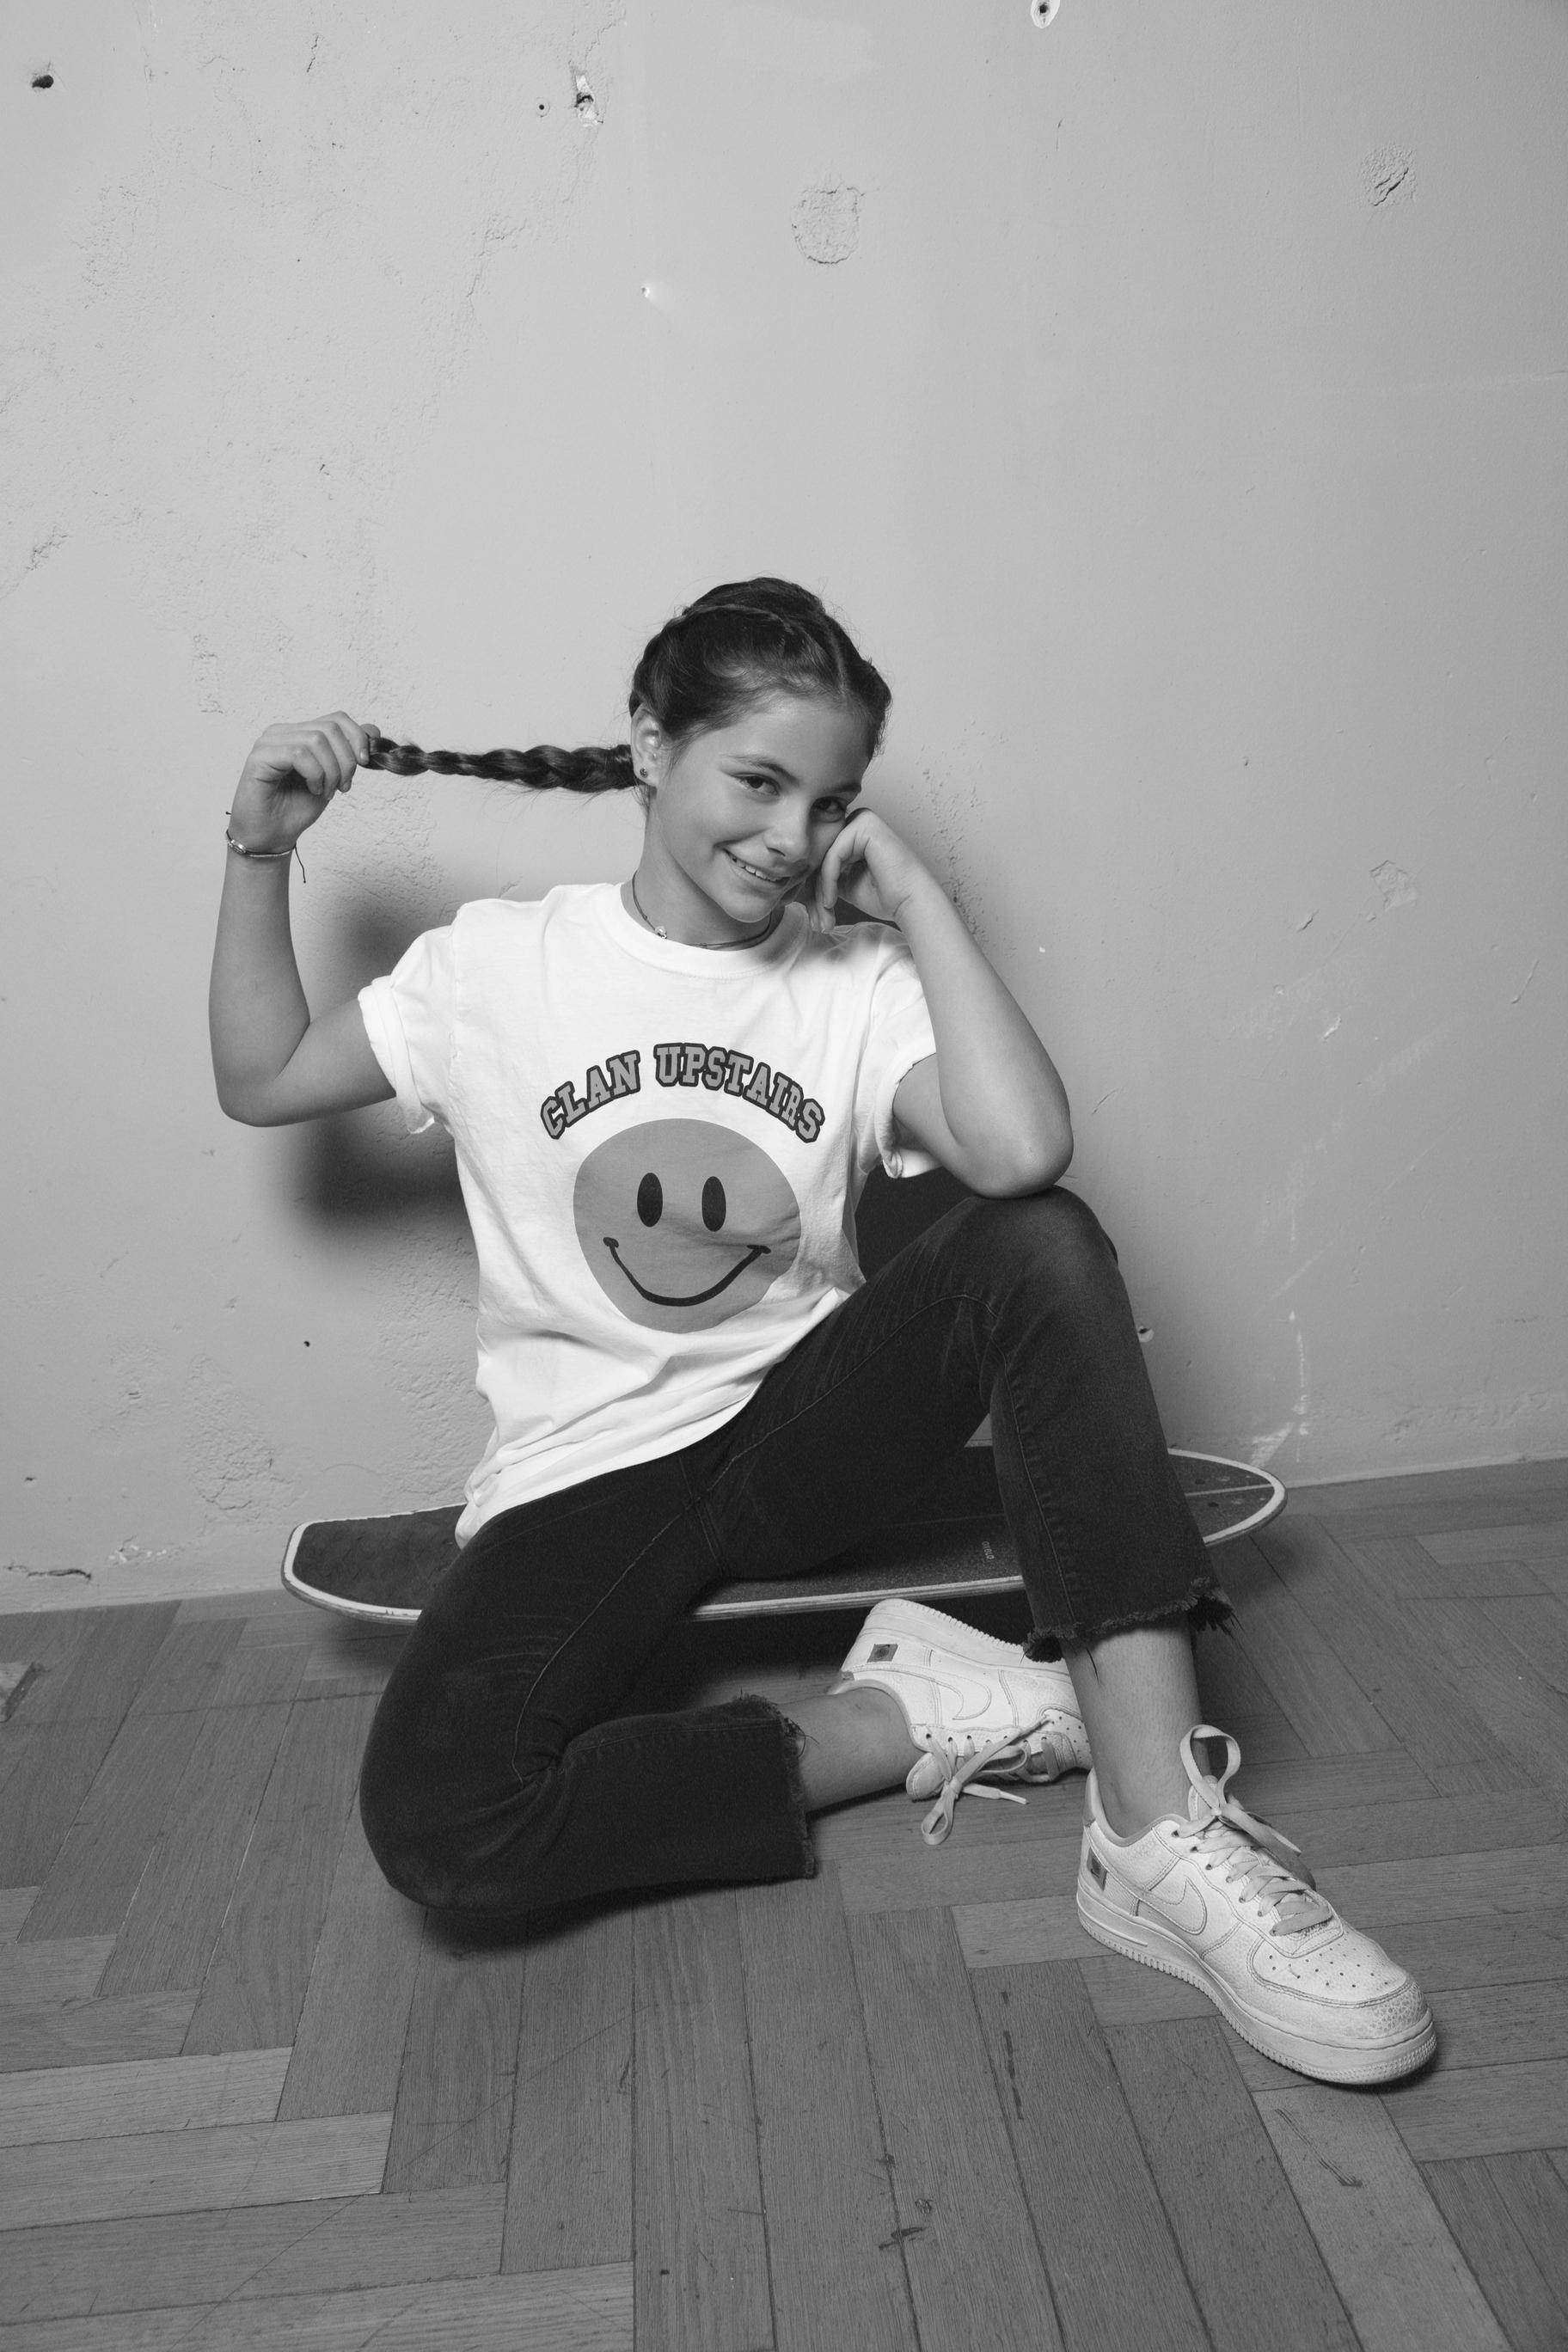 CLAN UPSTAIRS_KIND OF SMILE_POTRAIT_SS21_BIANCA BISOGNO SPAAK.jpg